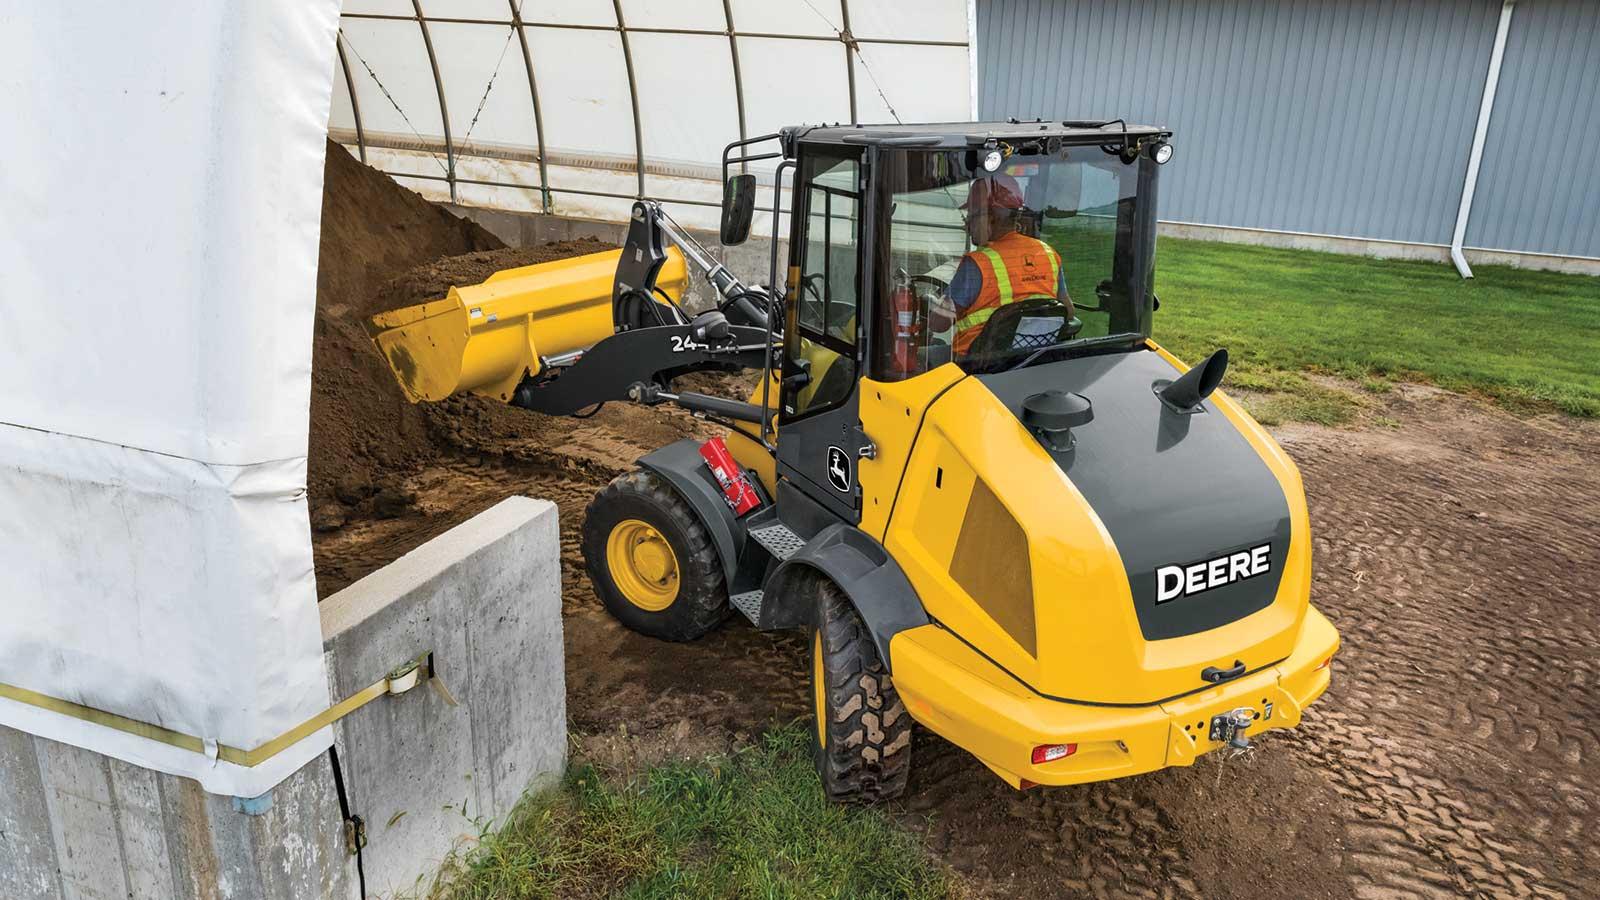 244L mini loader hauling dirt